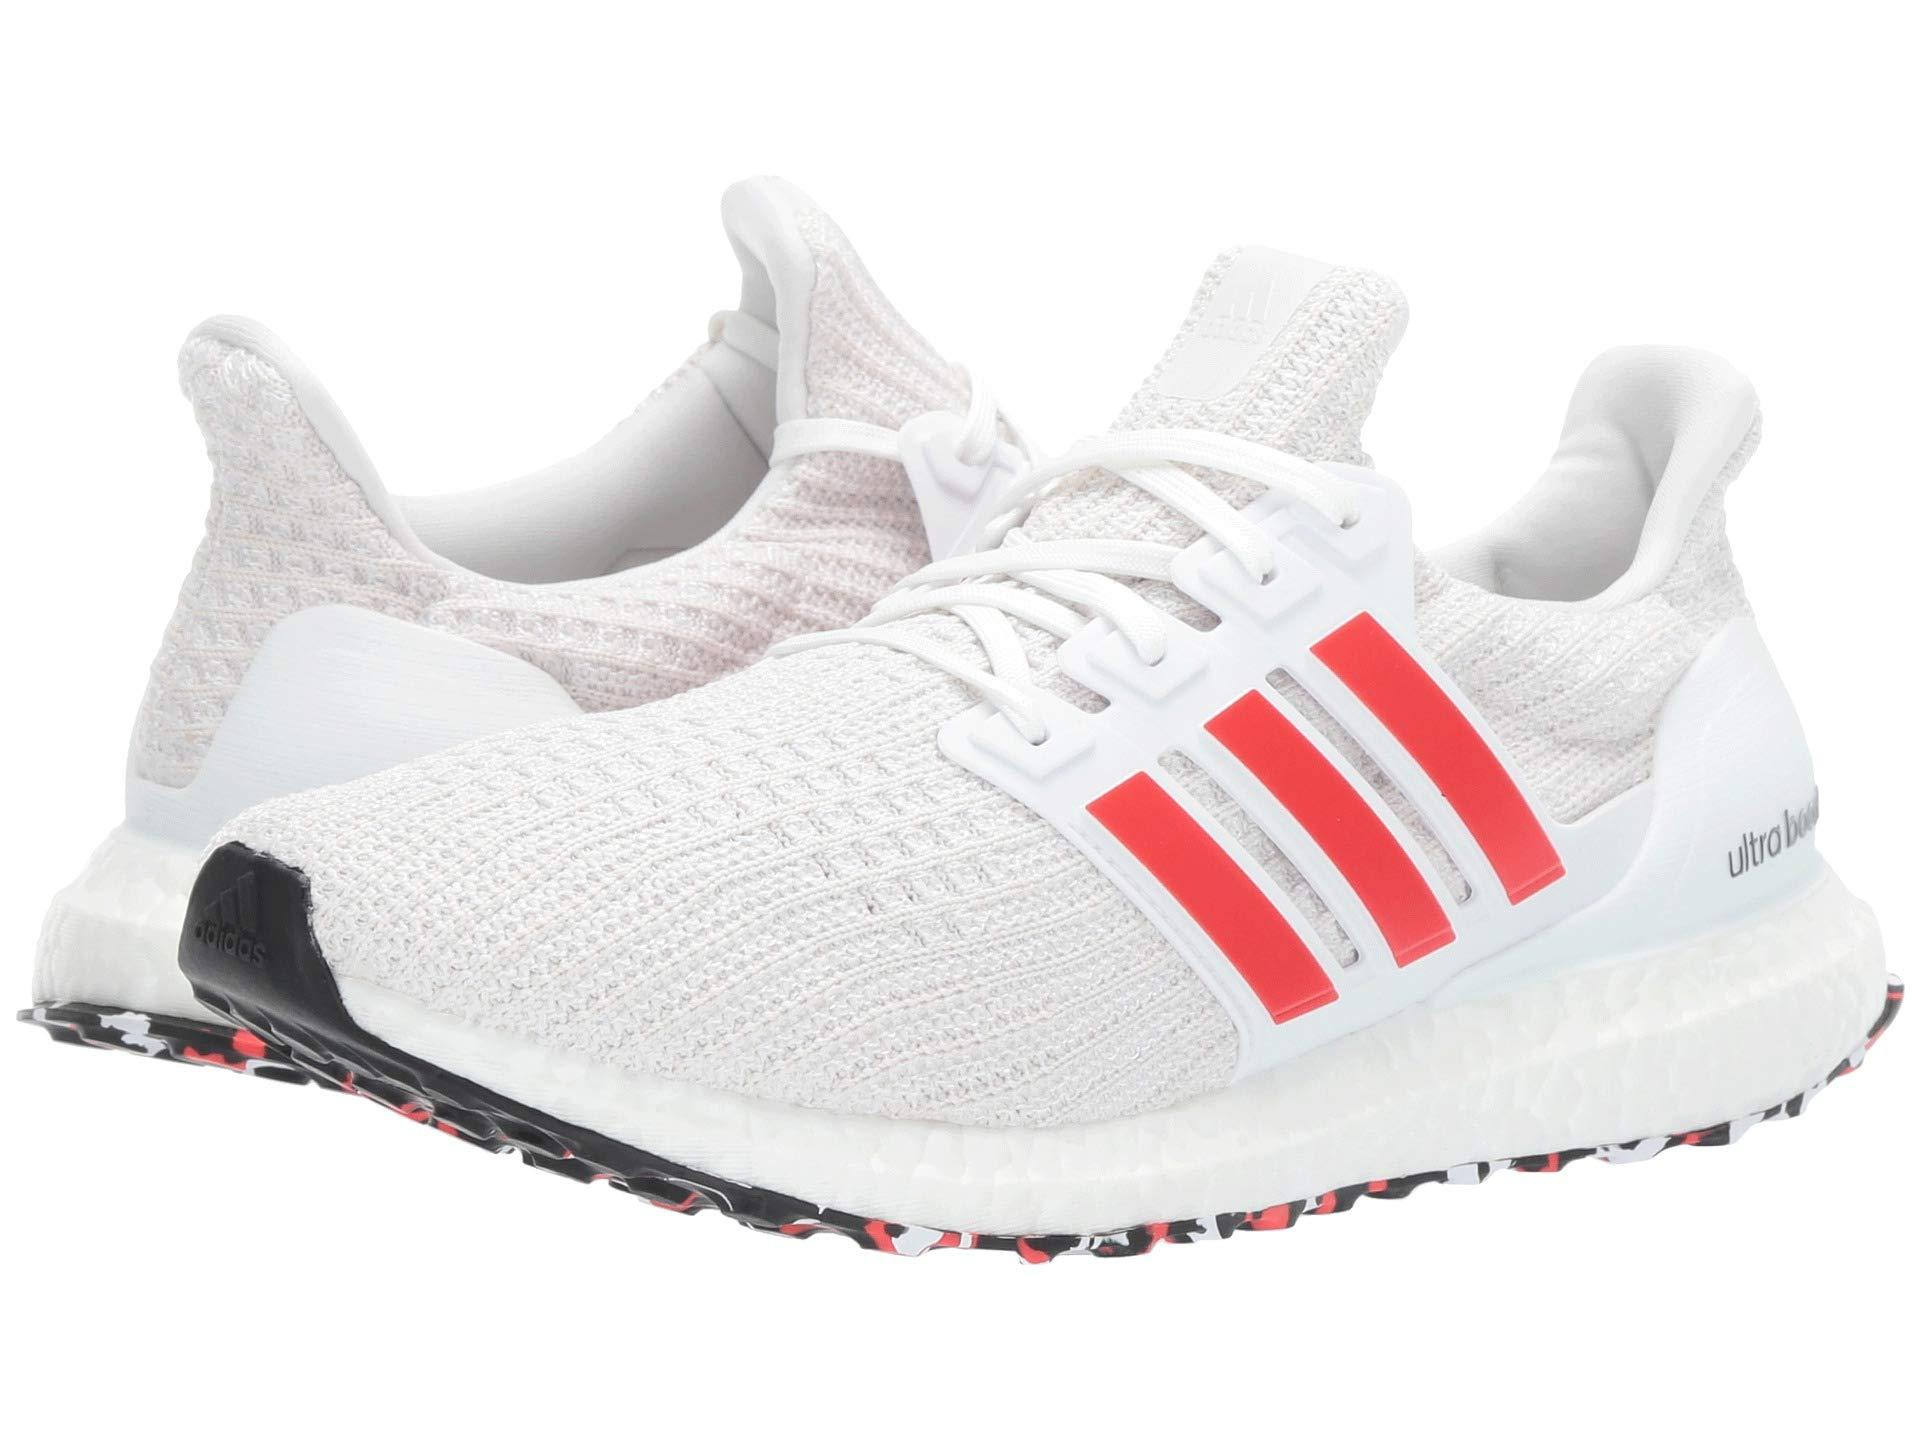 519253b2b adidas Originals. Ultraboost (core Black core Black active Red) Men s  Running Shoes